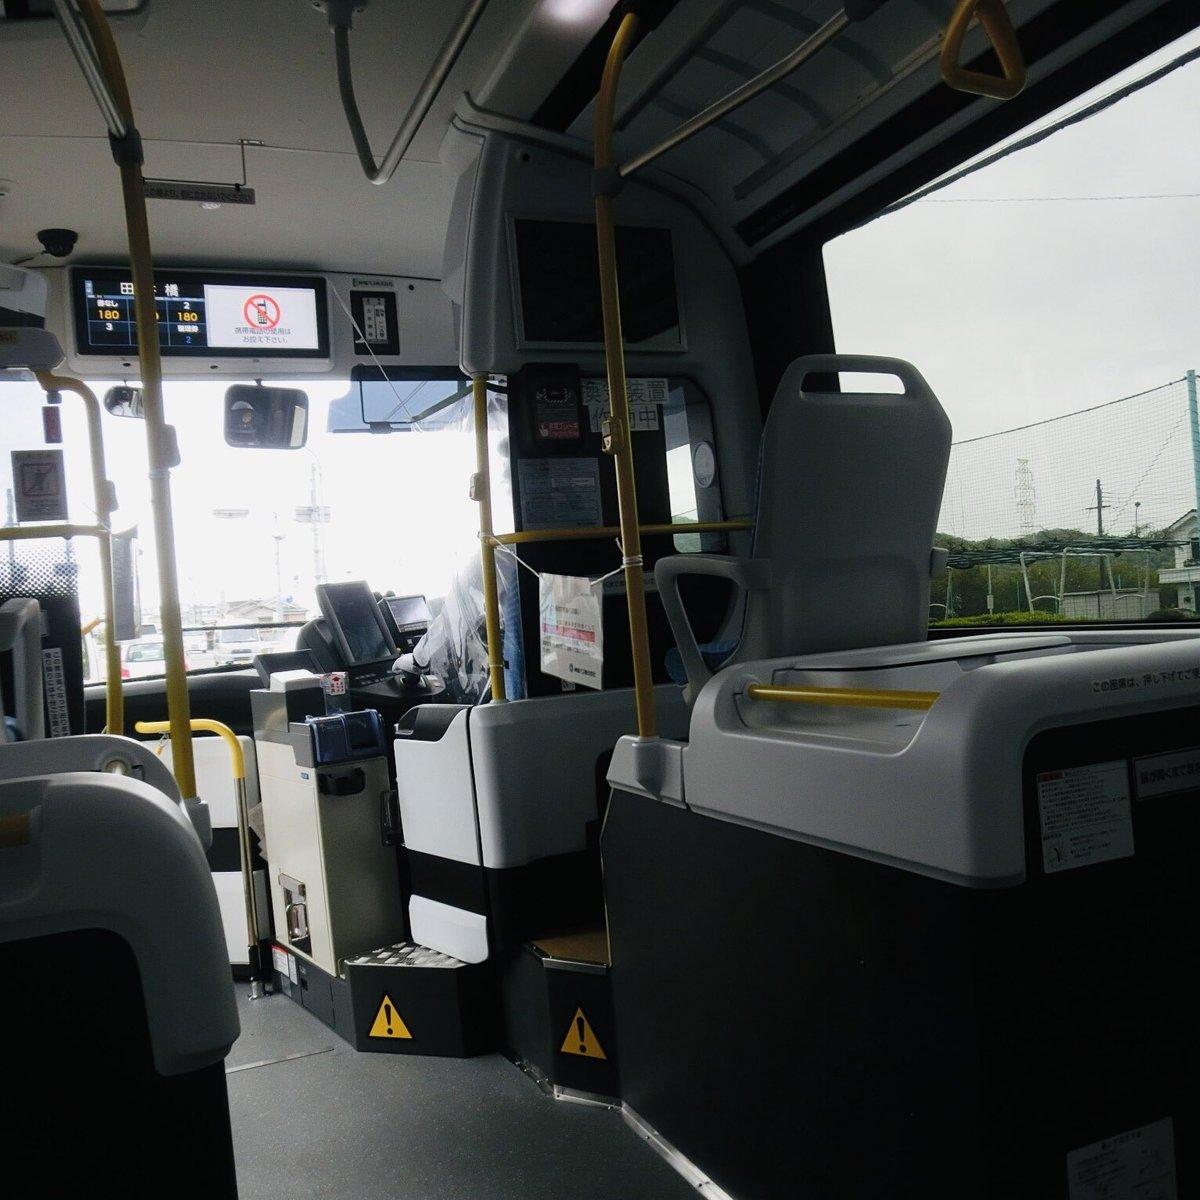 test ツイッターメディア - ◎神姫バスの水素で走る「燃料電池バス」に今朝当たりました!とても音が静か。10年前に故郷の姫路市に帰り副市長の時にバス通勤を始めてから数千回バスに乗りました。  ◎東辻井の橋本製菓を訪問。柏餅一筋で70年。コロナで納品先の料亭などの需要が減り苦労されています。1975年のレトロな餅つき機。 https://t.co/QmzHMMHea3